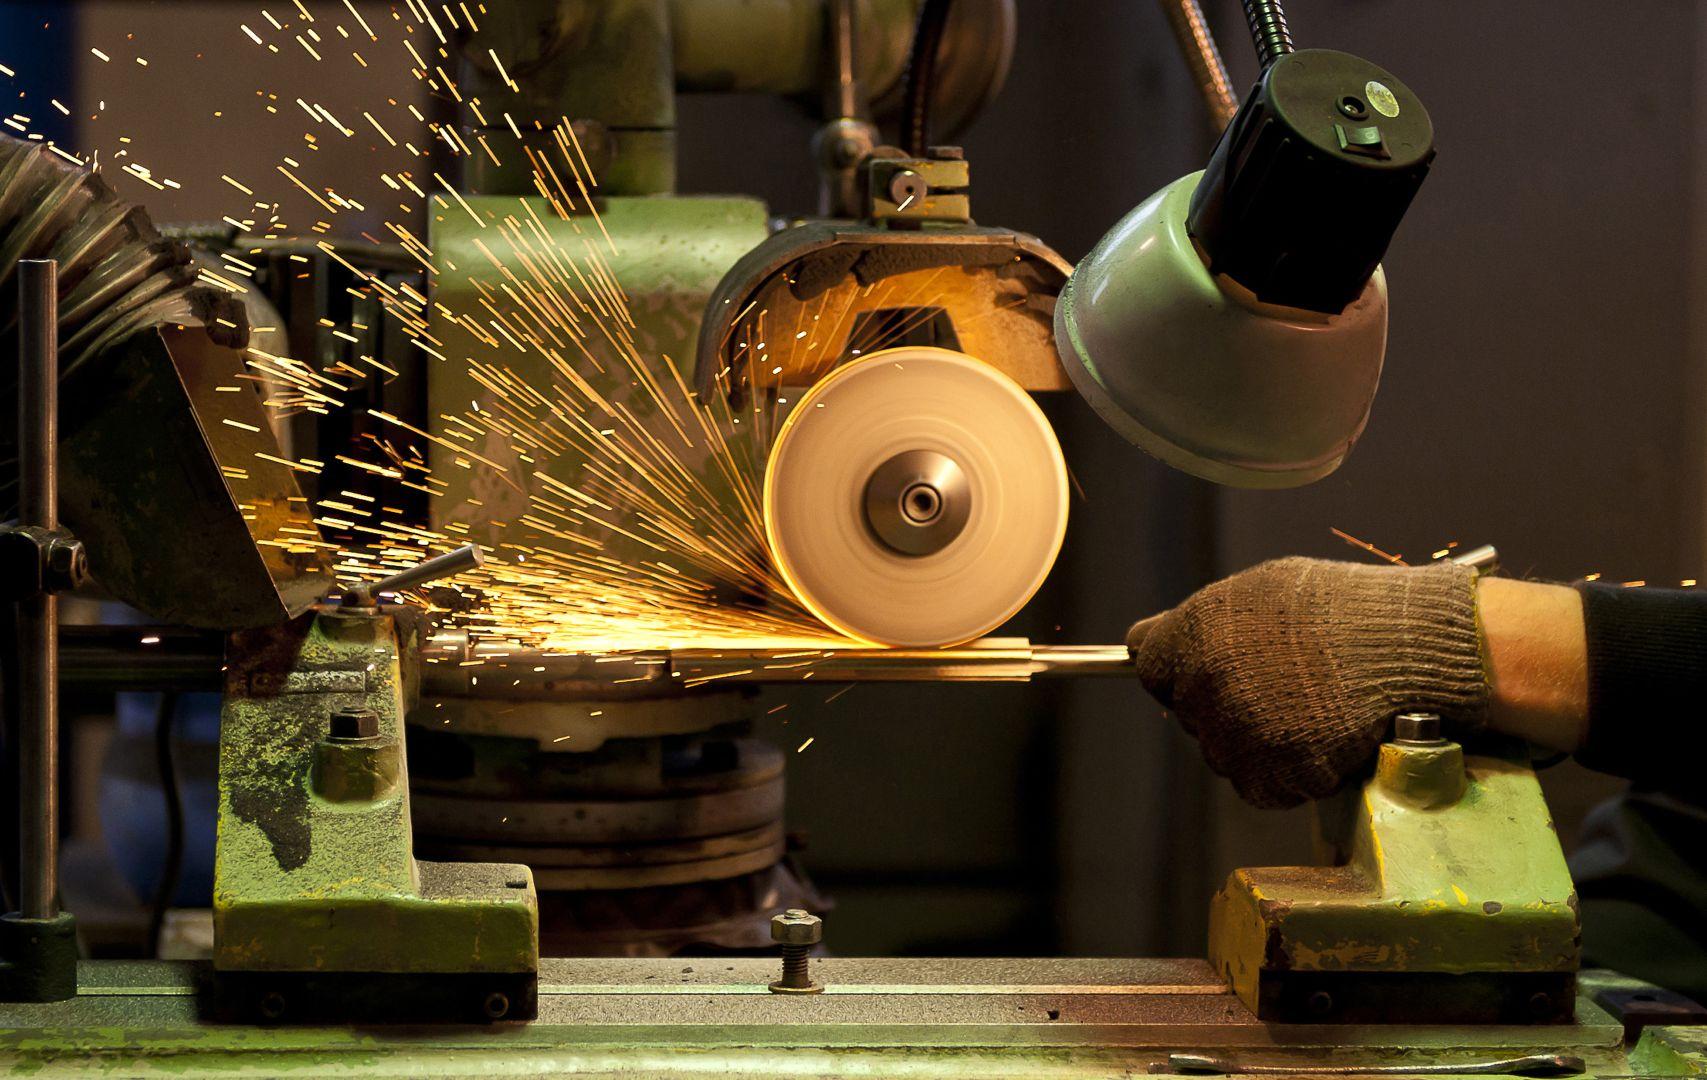 Machine Tools - Repair & Rebuild